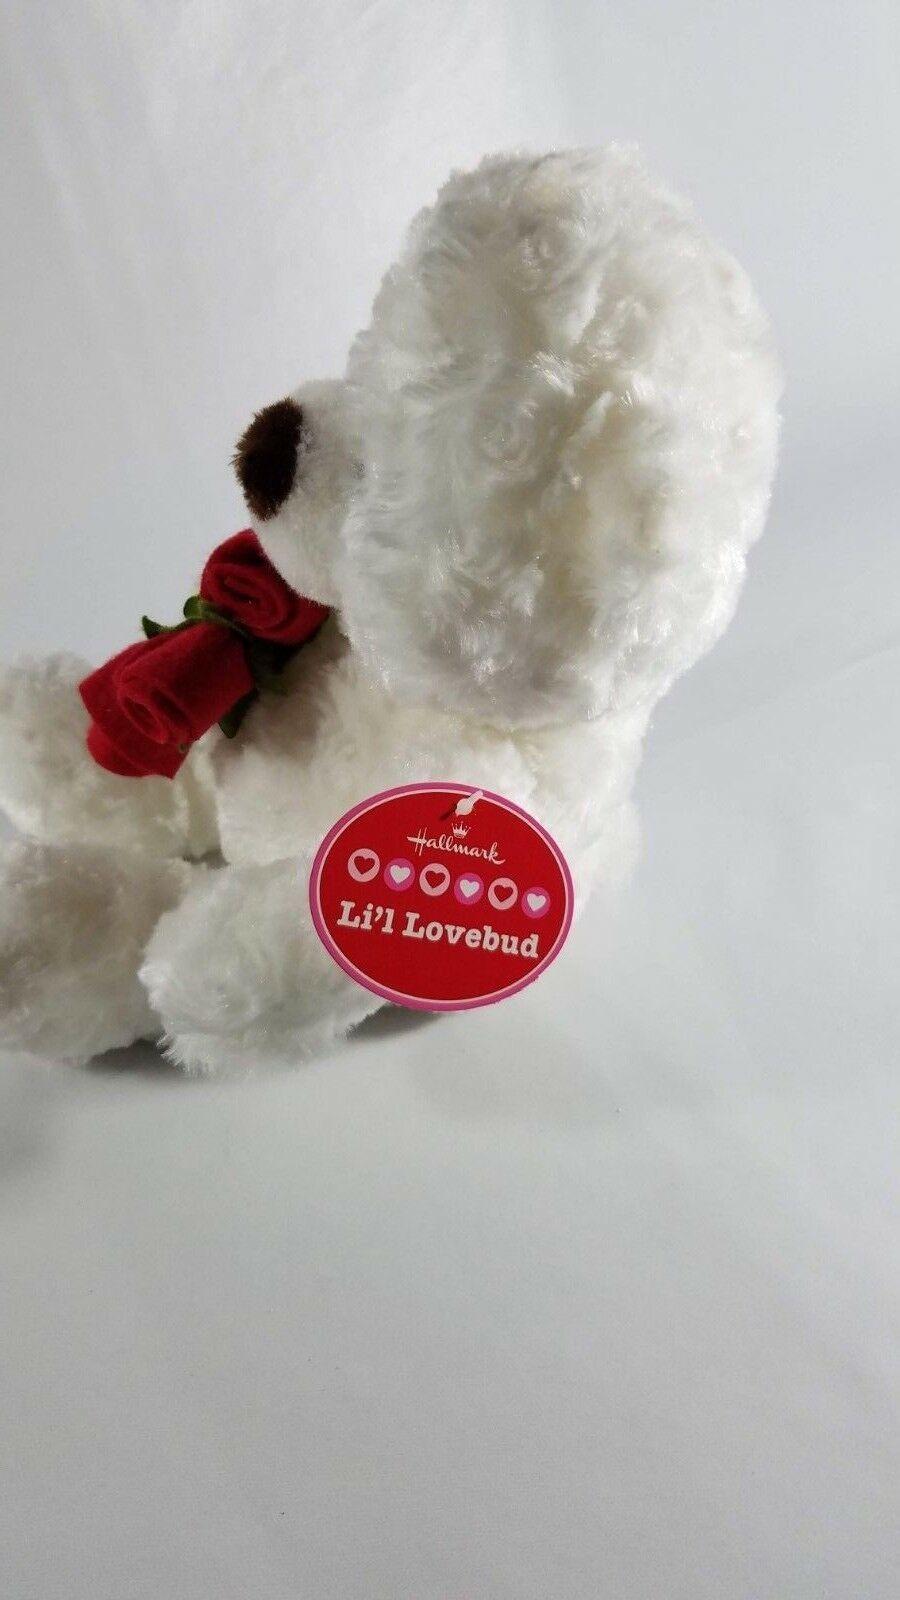 "Hallmark Li'l Lovebud White Bear Plush w/ Rose 11"" Stuffed Animal"